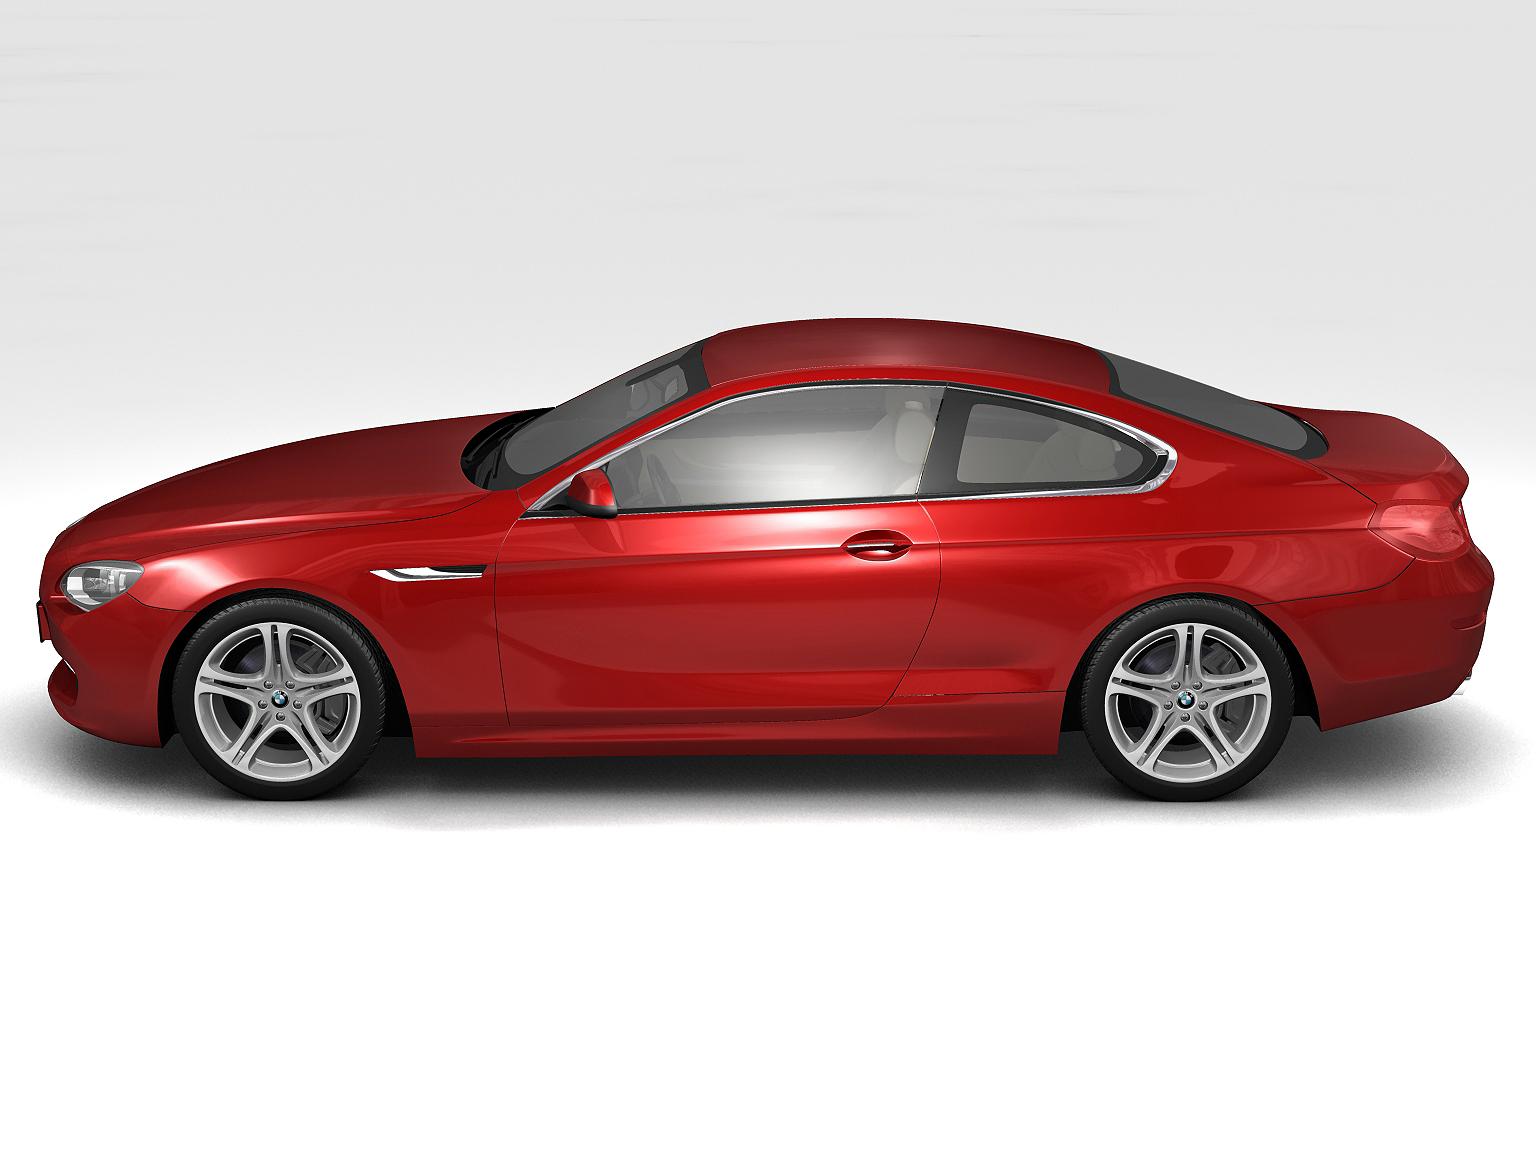 2011 BMW 6 Series Coupe 68674KB Jpg By 3dken